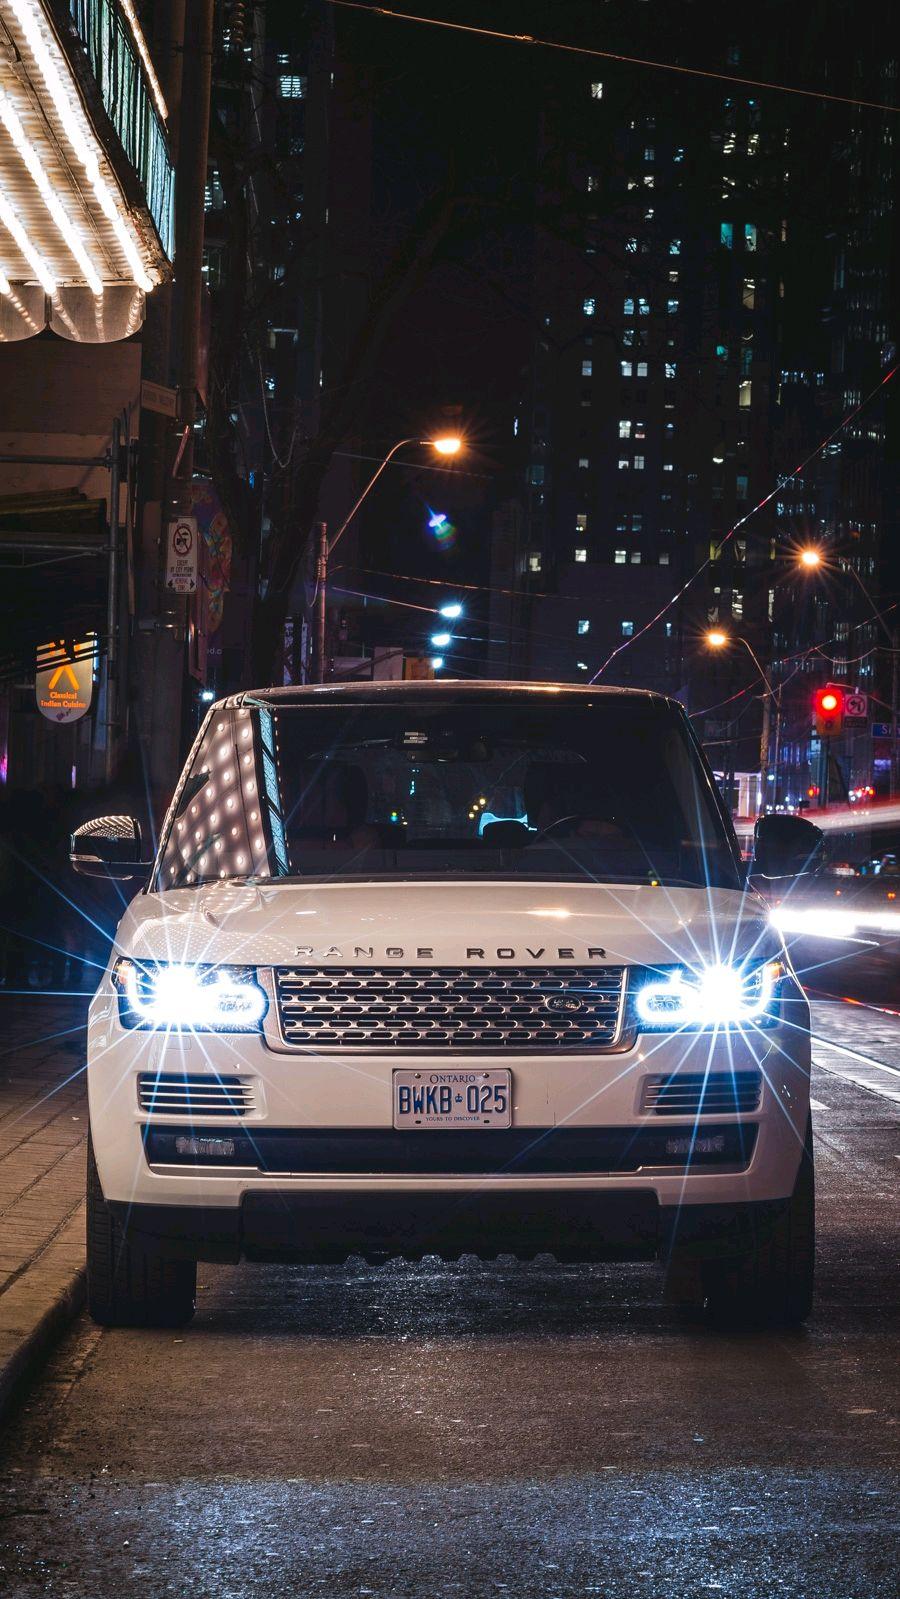 Audi Full Hd Wallpaper Download Range Rover Vogue Night Lights Luxury Iphone Wallpaper